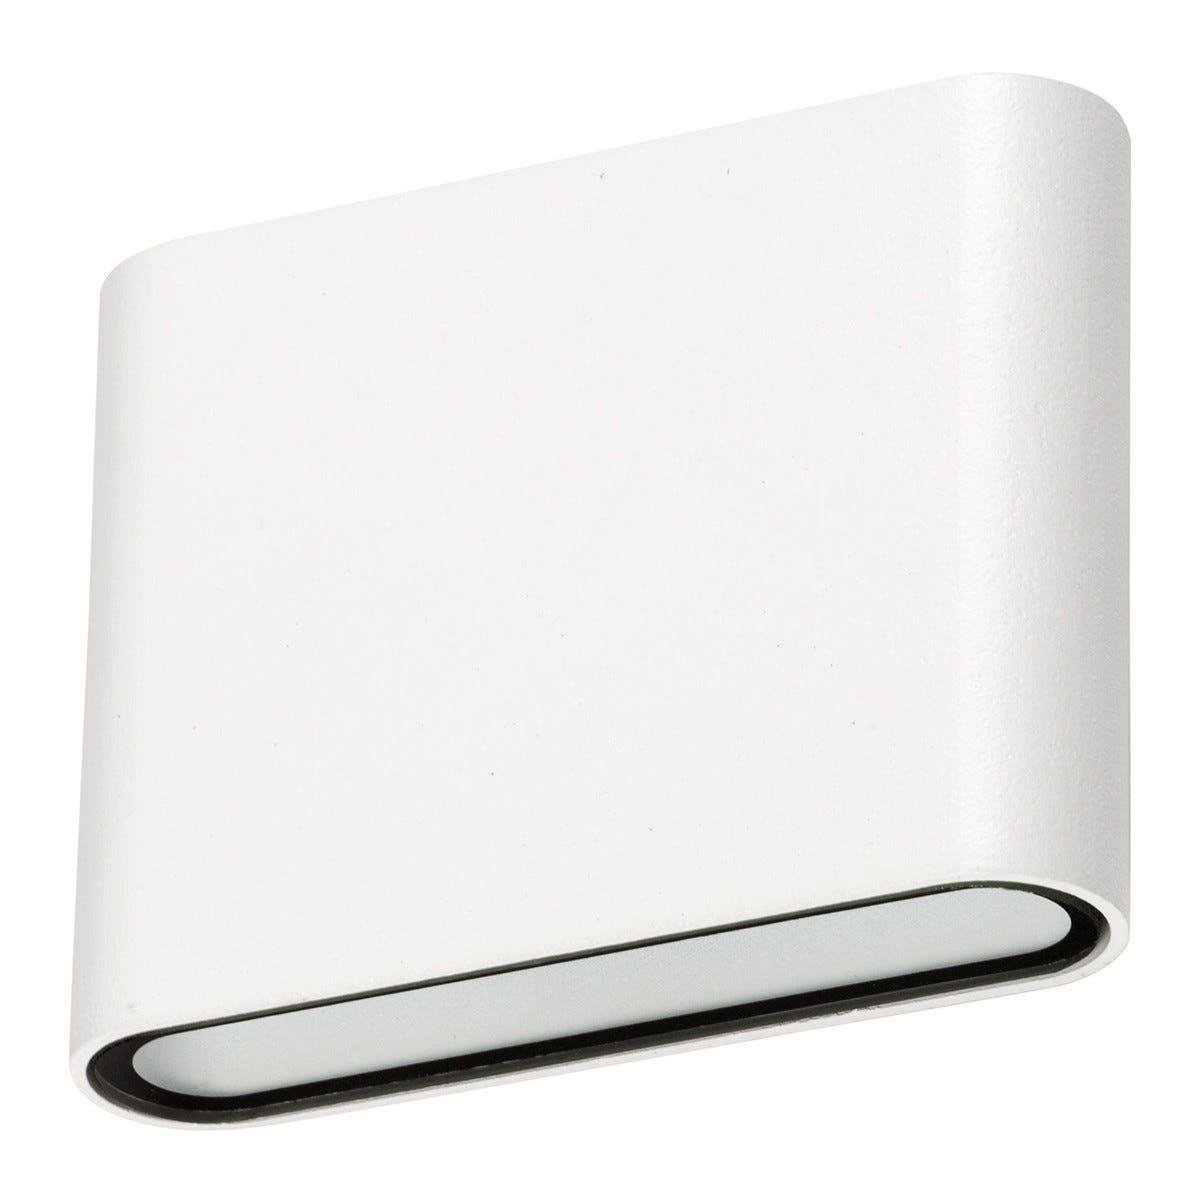 VIVIDA Lampada Esterno Slim Tonda Piccola Led 6w In Alluminio Bianca